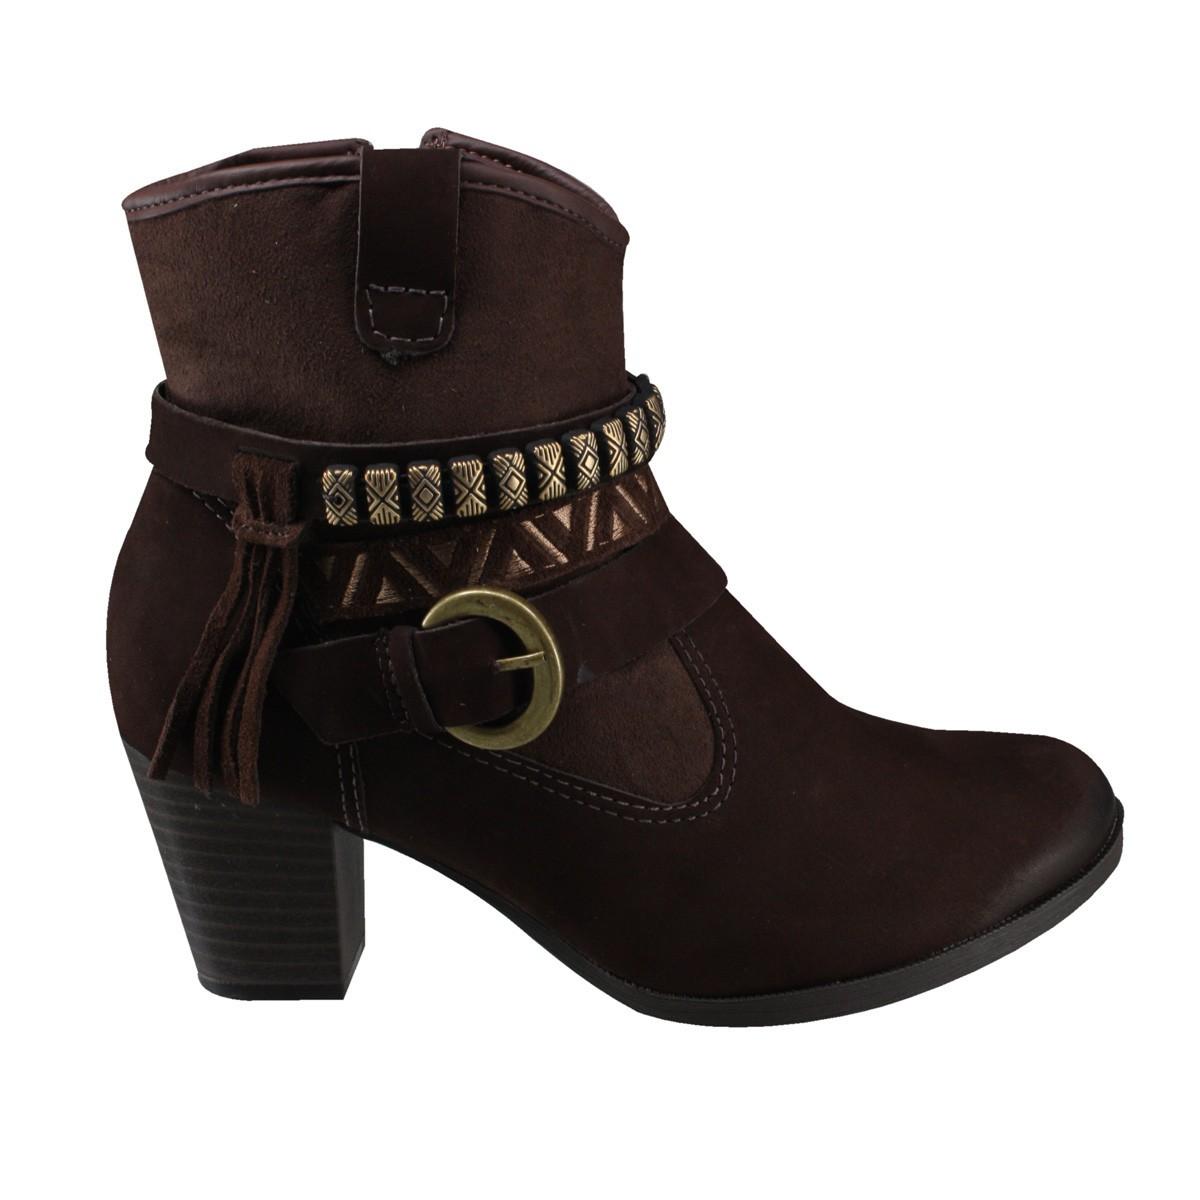 fc5b519f8d Bizz Store - Bota Feminina Dakota Indianápolis Cano Curto Marrom